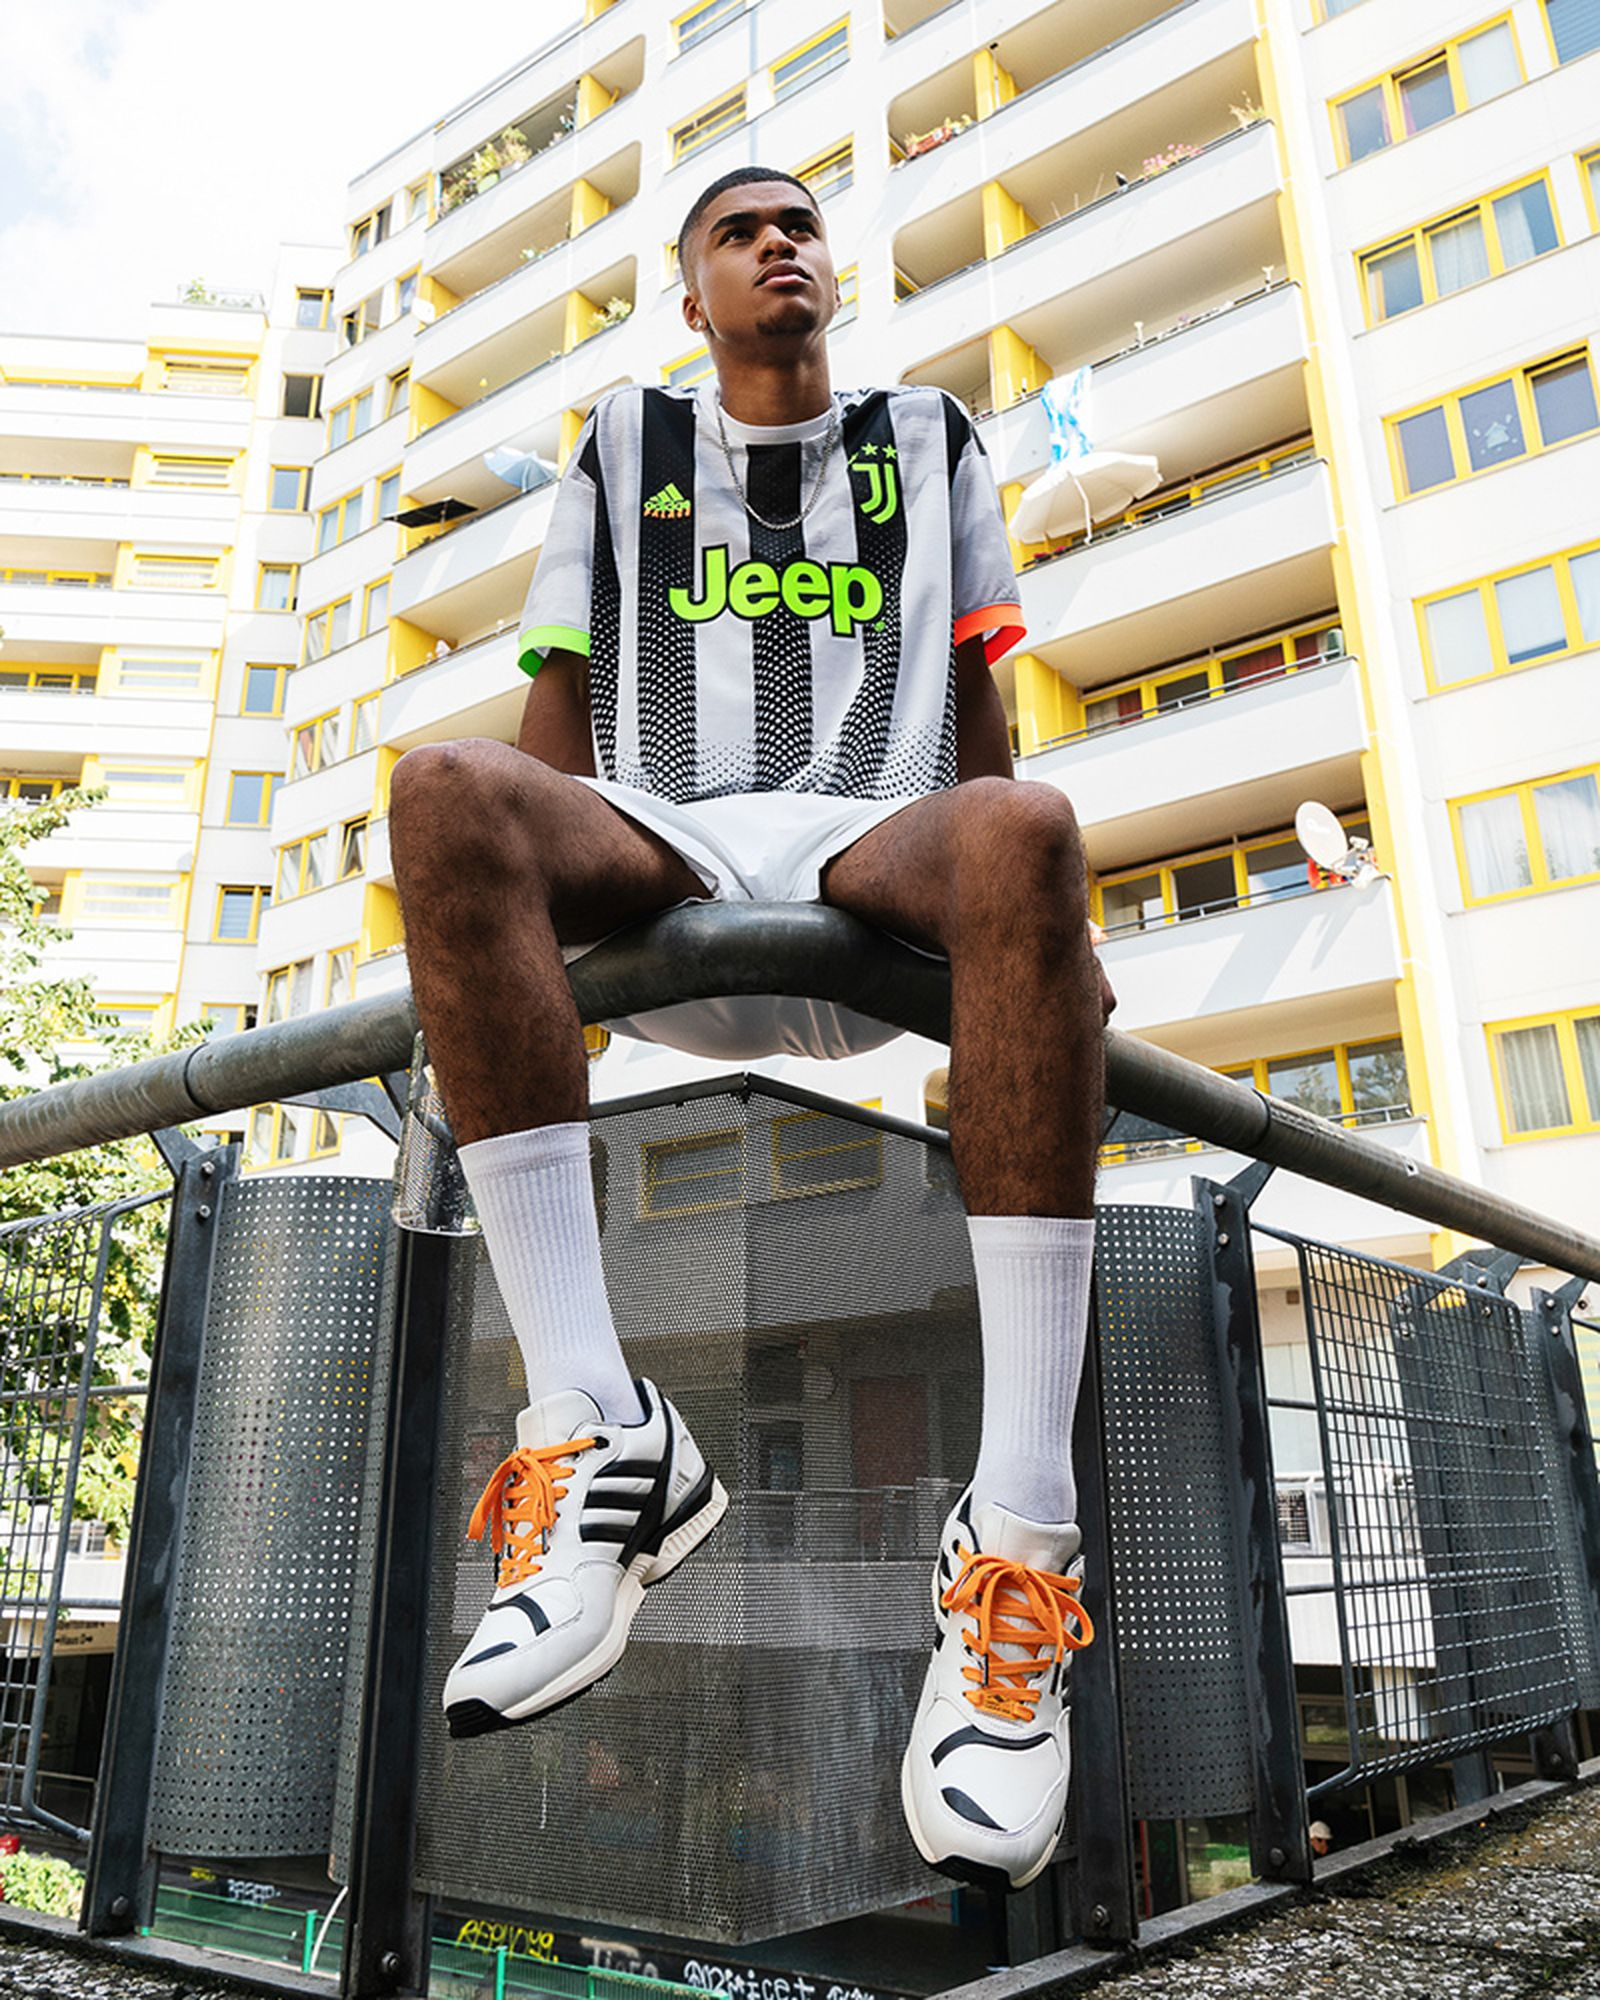 educar protesta flor  Juventus x adidas ZX 6000: Official Images & Release Information